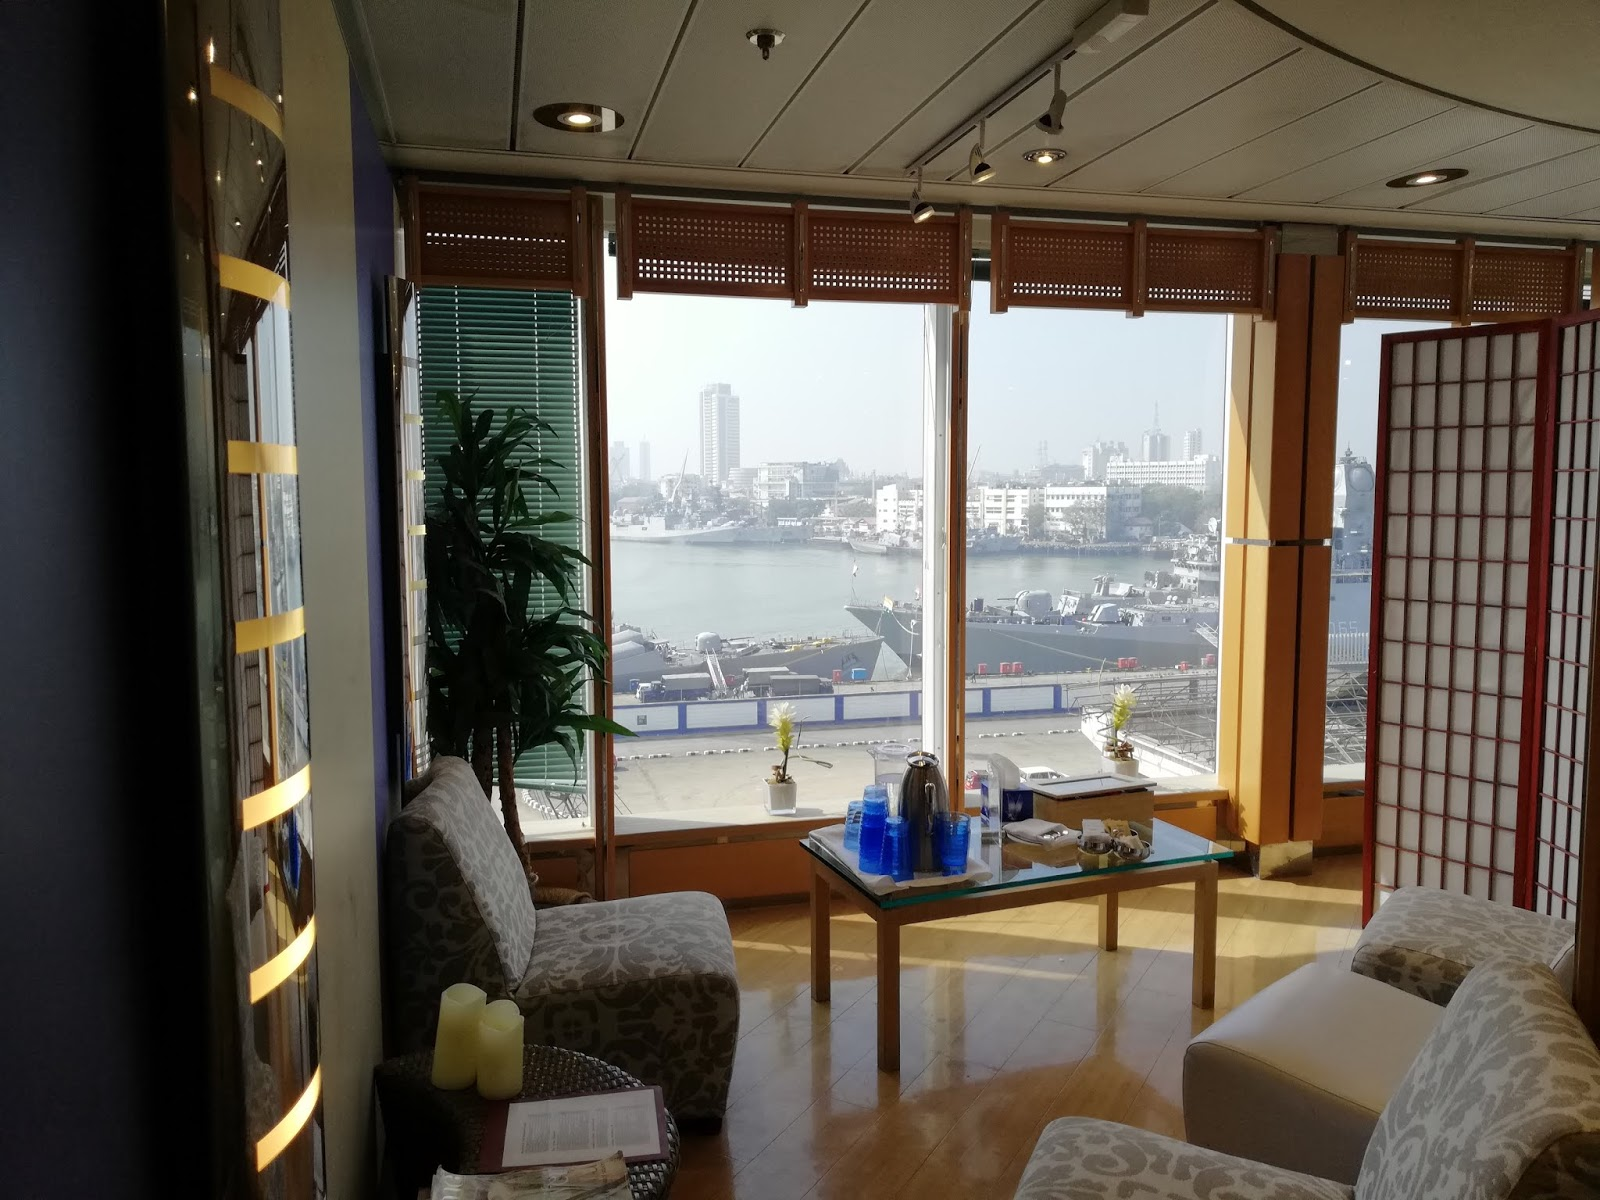 Spirit Of Mumbai Costa Cruises Celebrates 3rd Season Of Homeporting In The Indian Waters